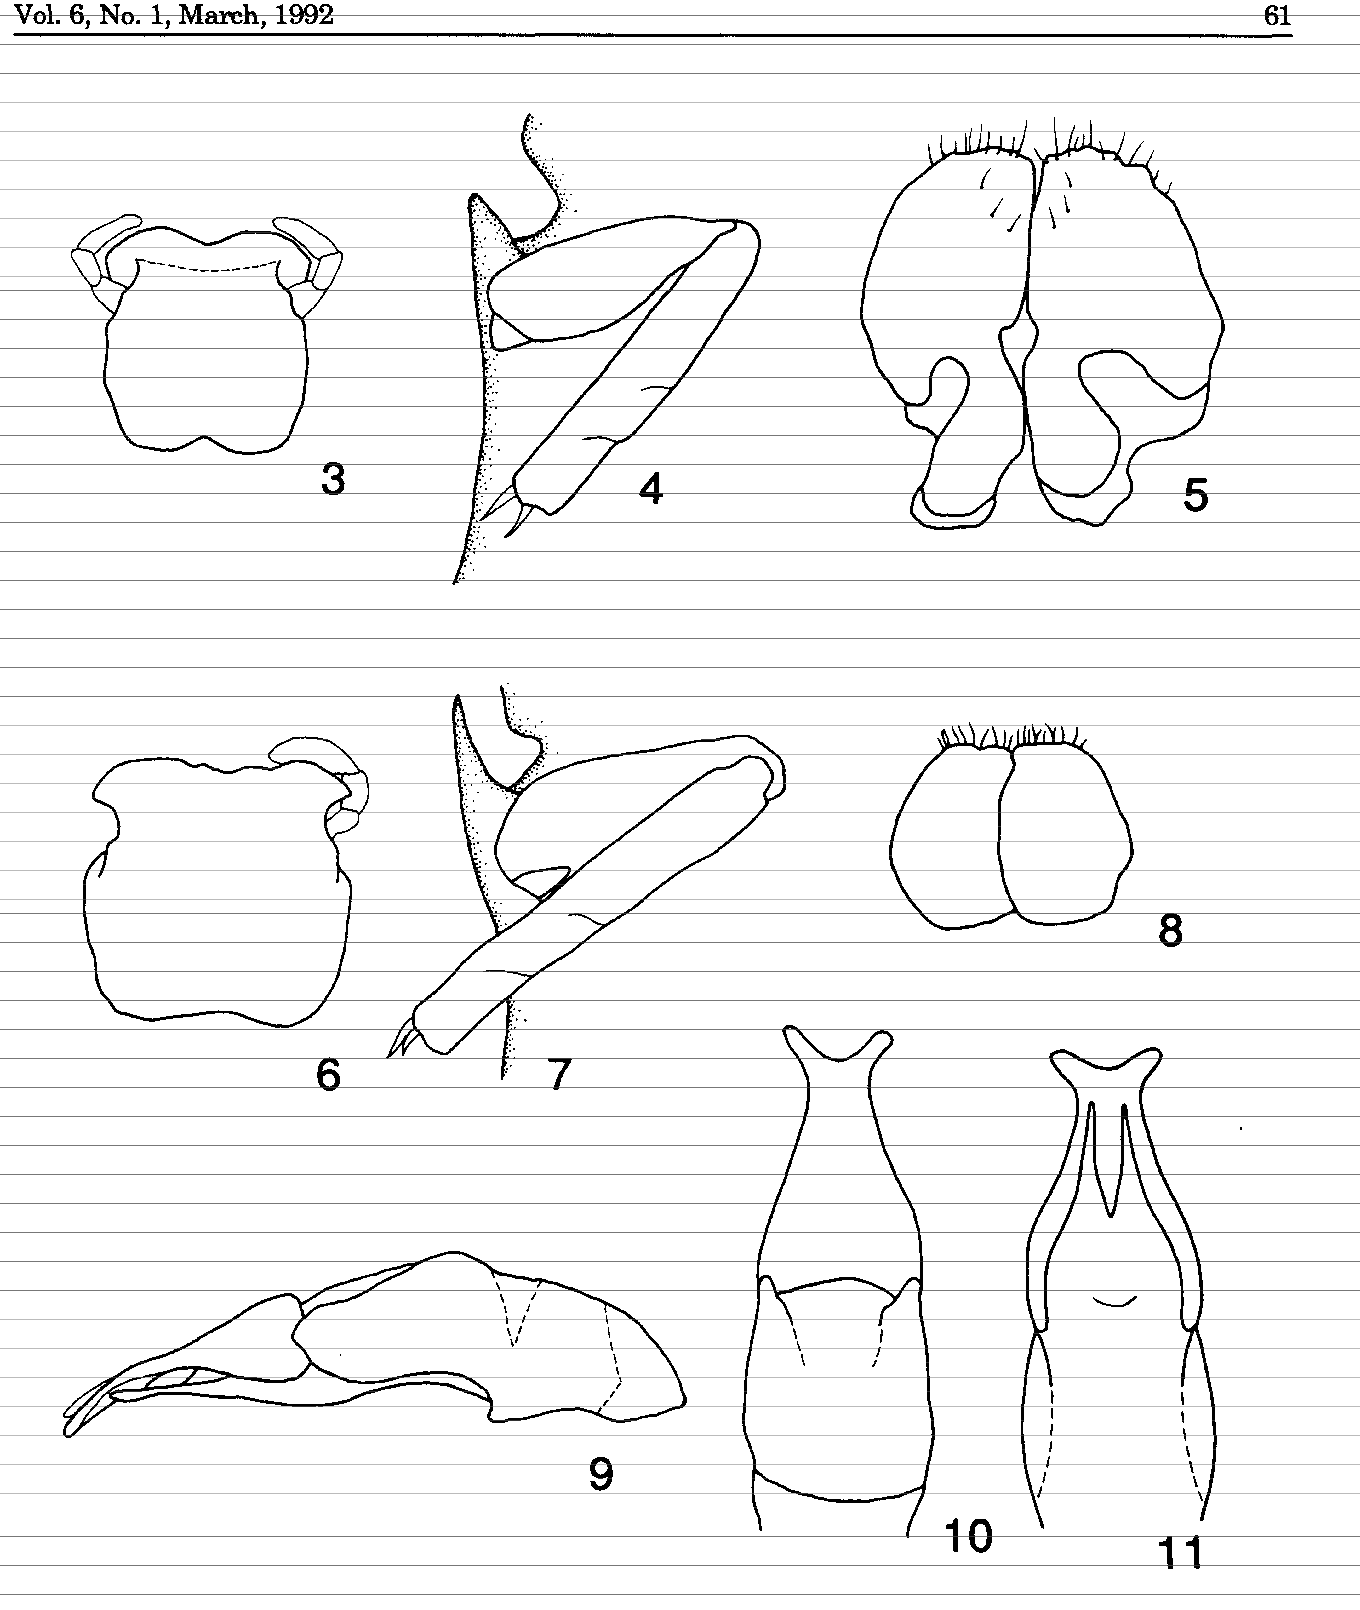 figure 3·11